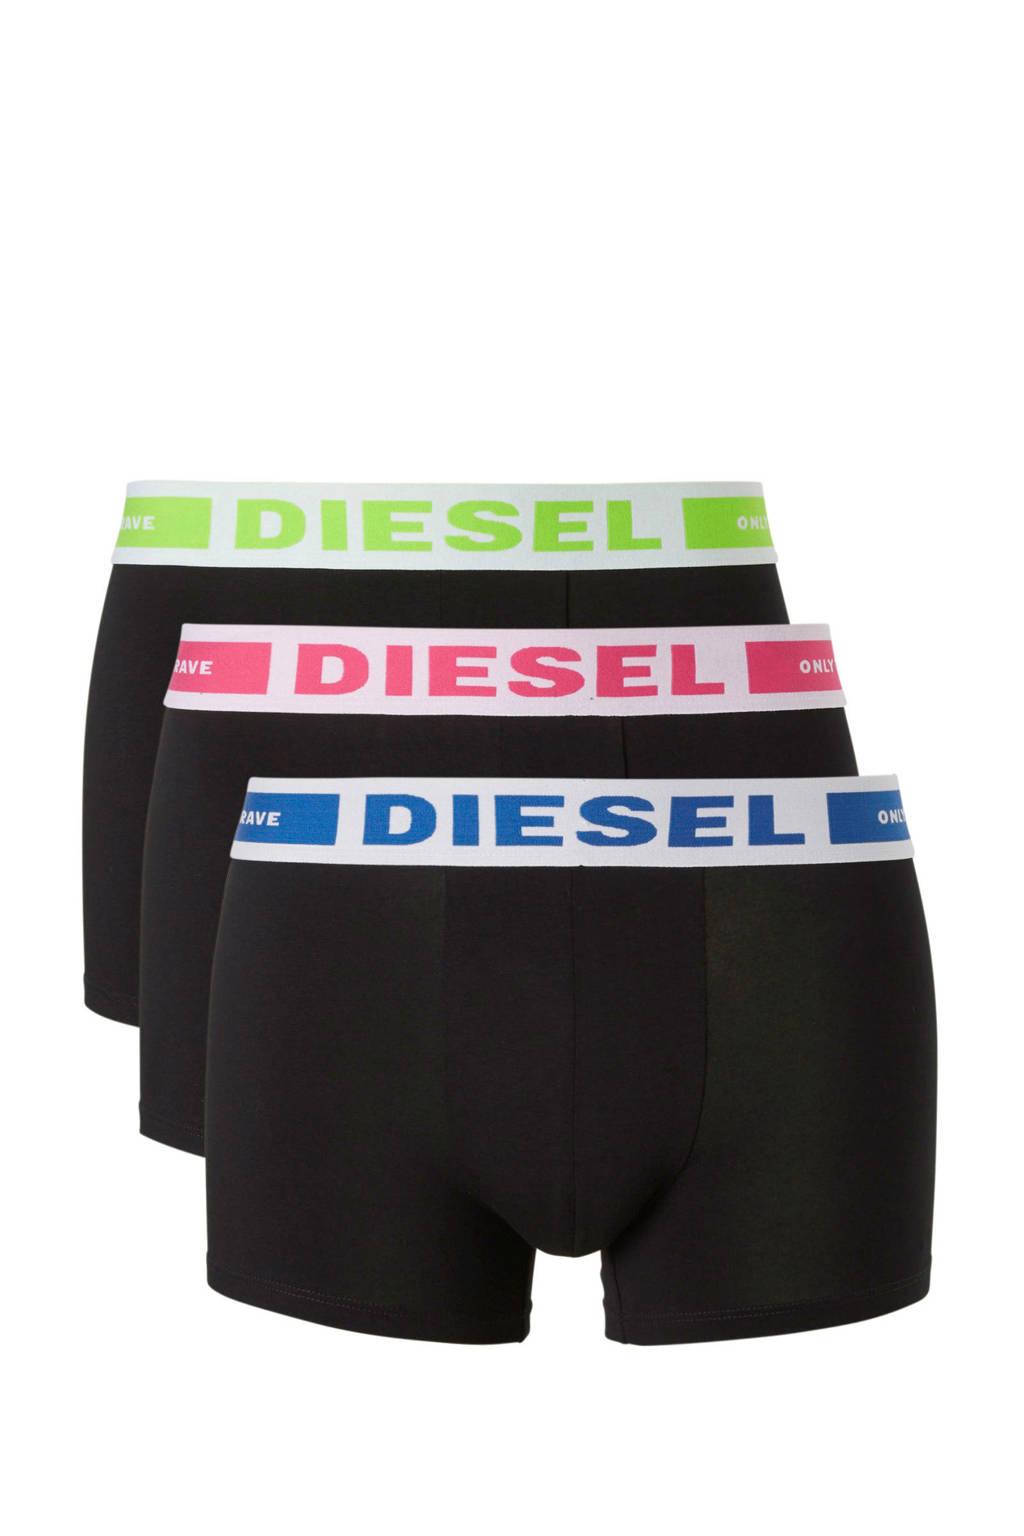 Diesel boxershort (set van 3), Zwart